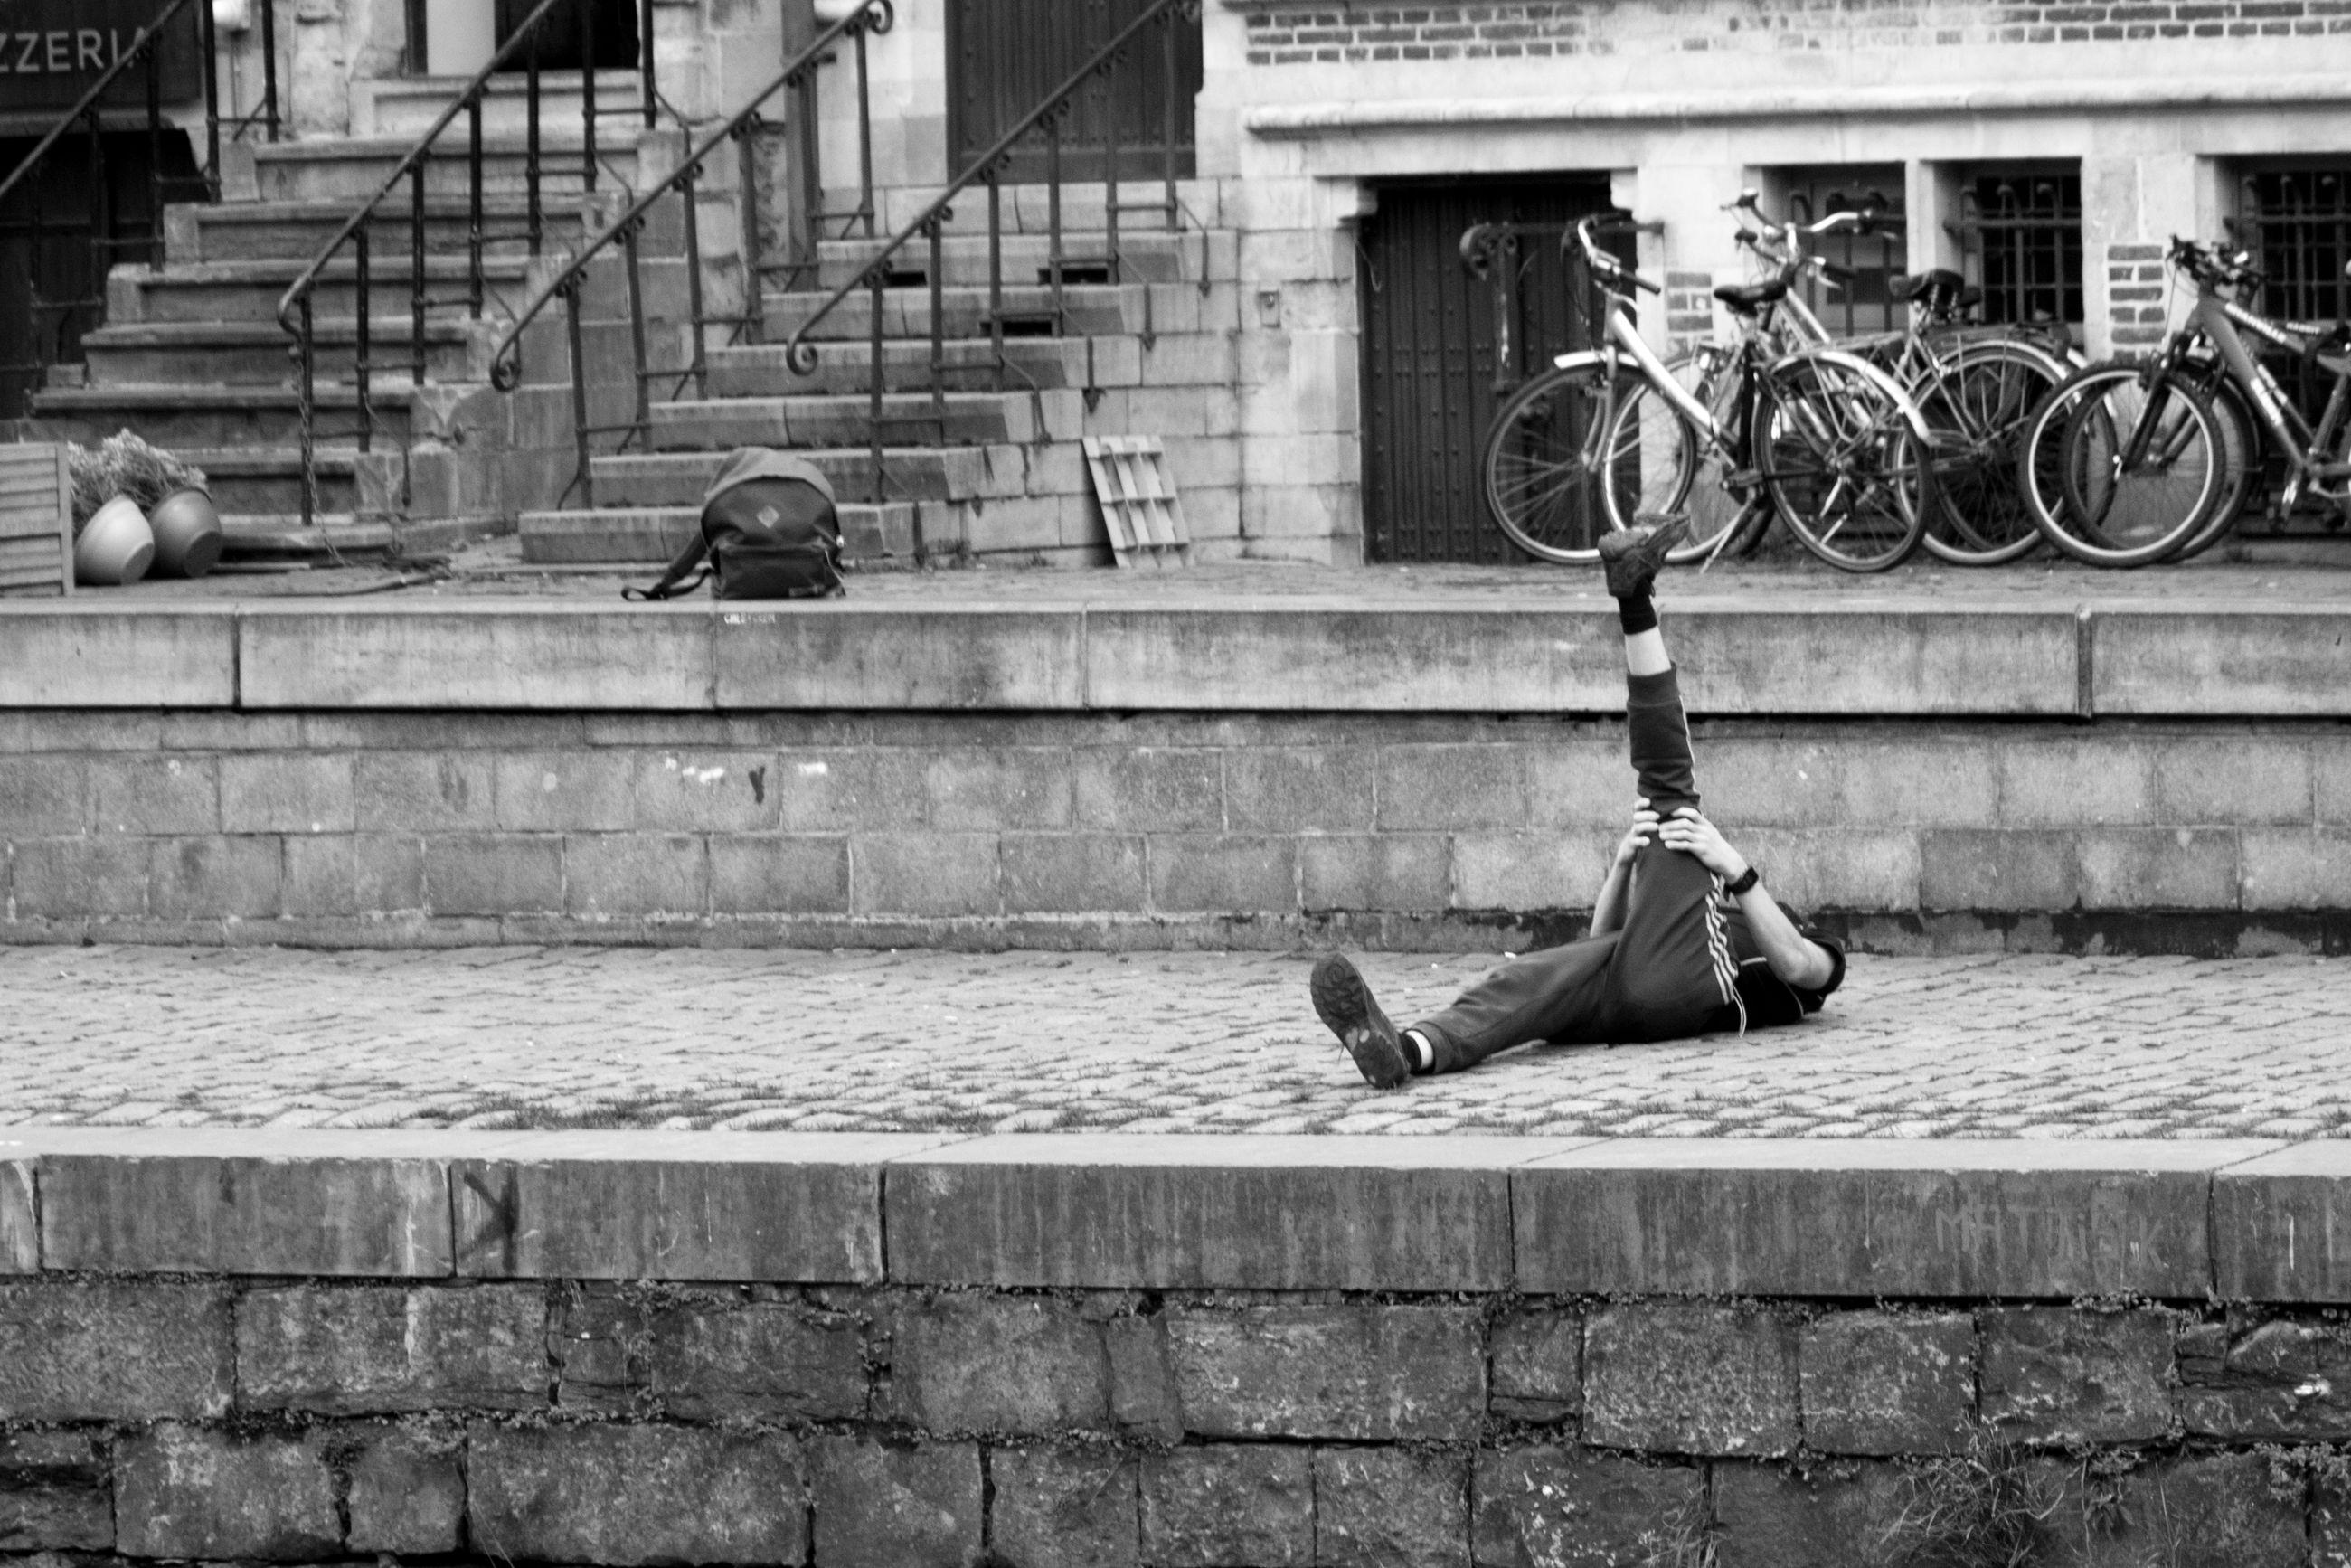 MAN CYCLING ON RETAINING WALL